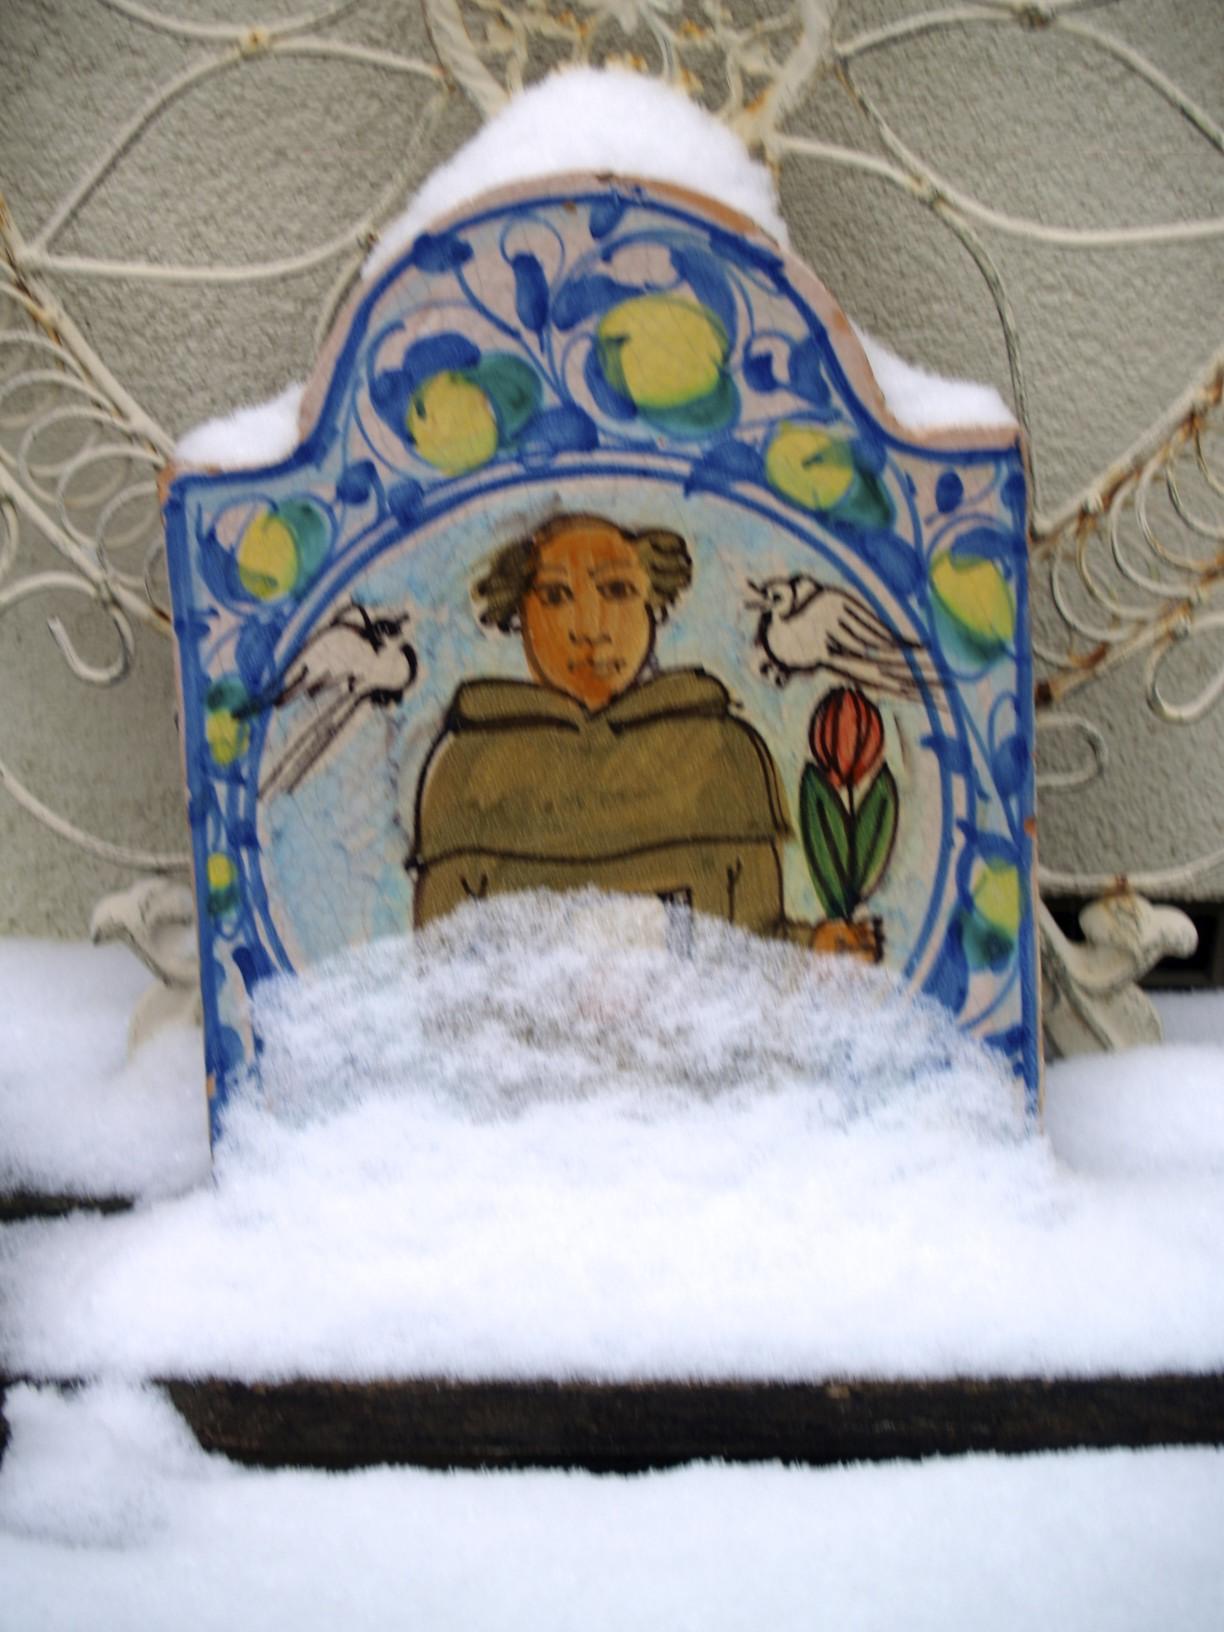 snow on St. Francis